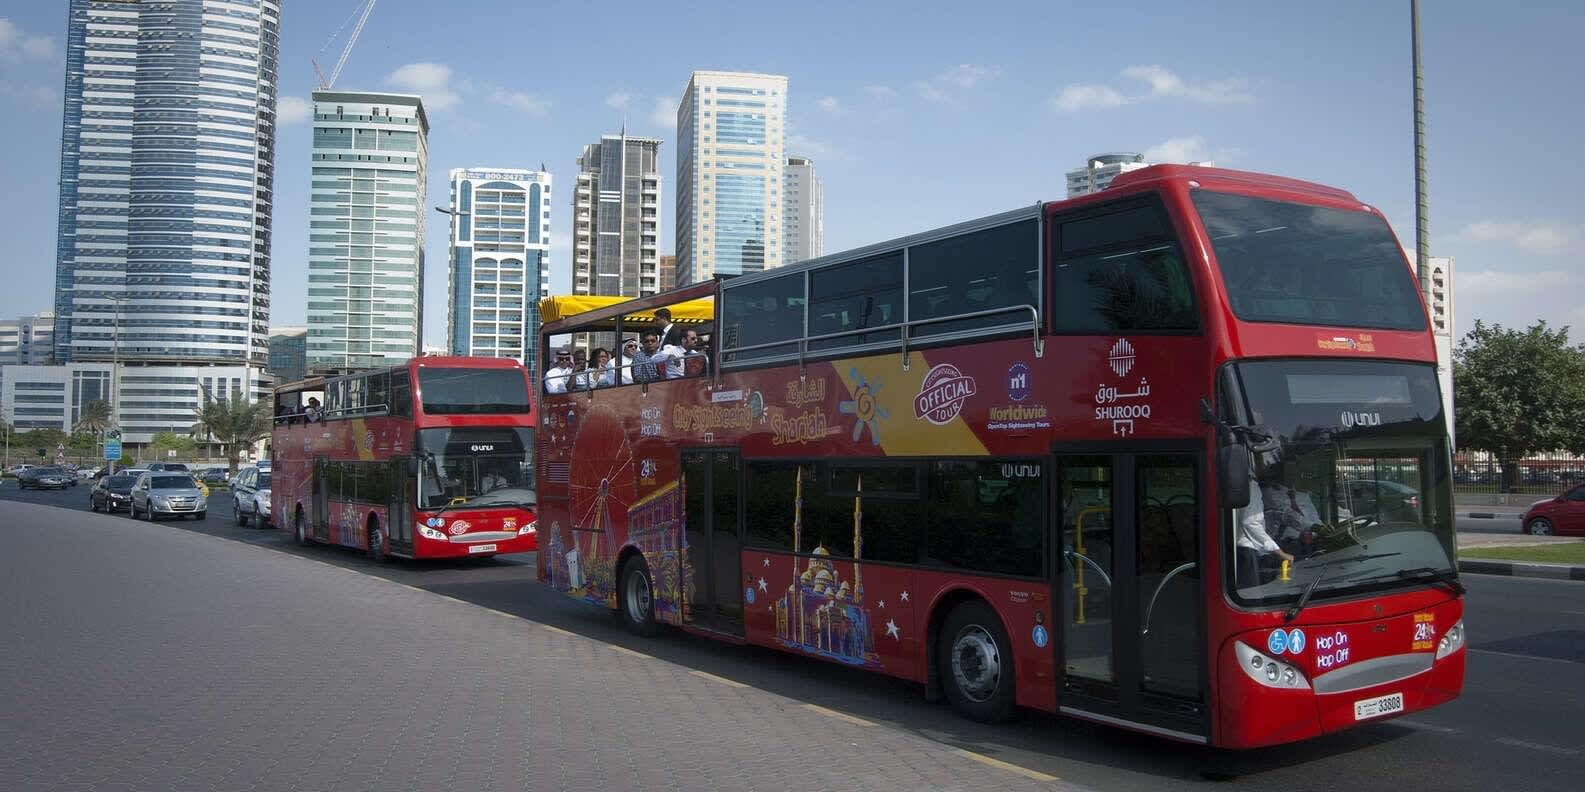 City Sightseeing Sharjah